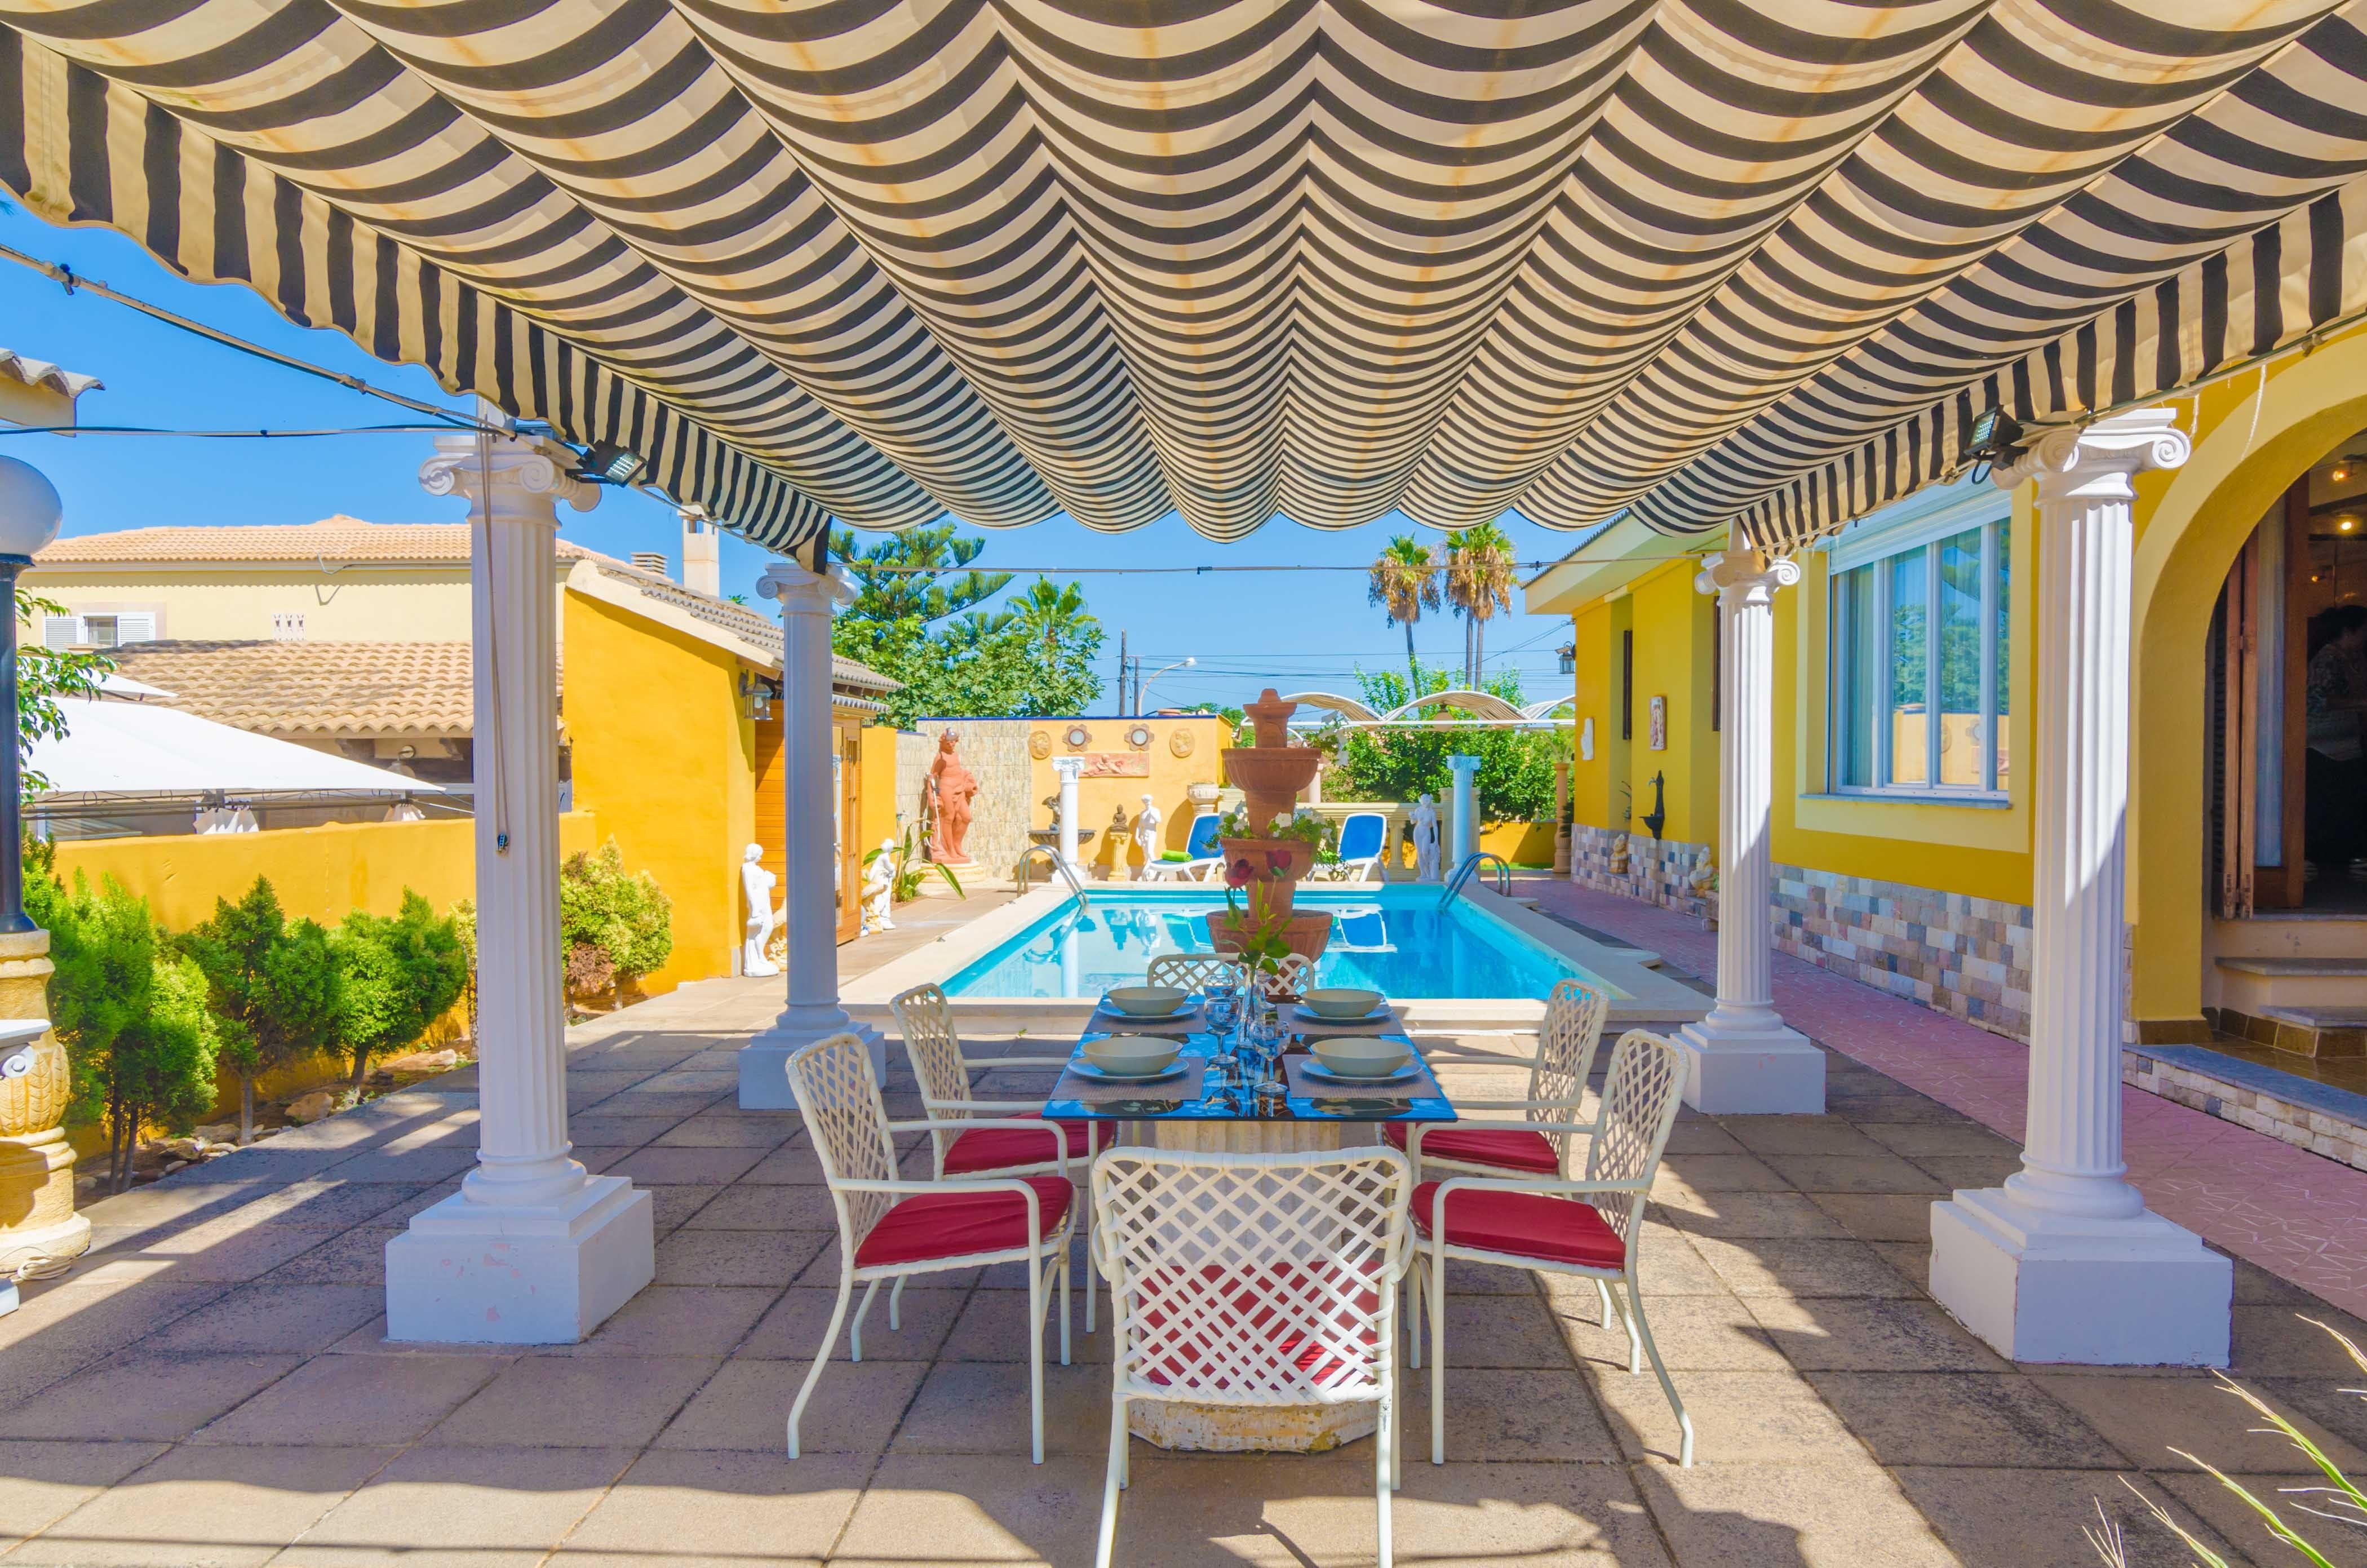 Ferienhaus CAN GORI (2296828), Badia Gran, Mallorca, Balearische Inseln, Spanien, Bild 4